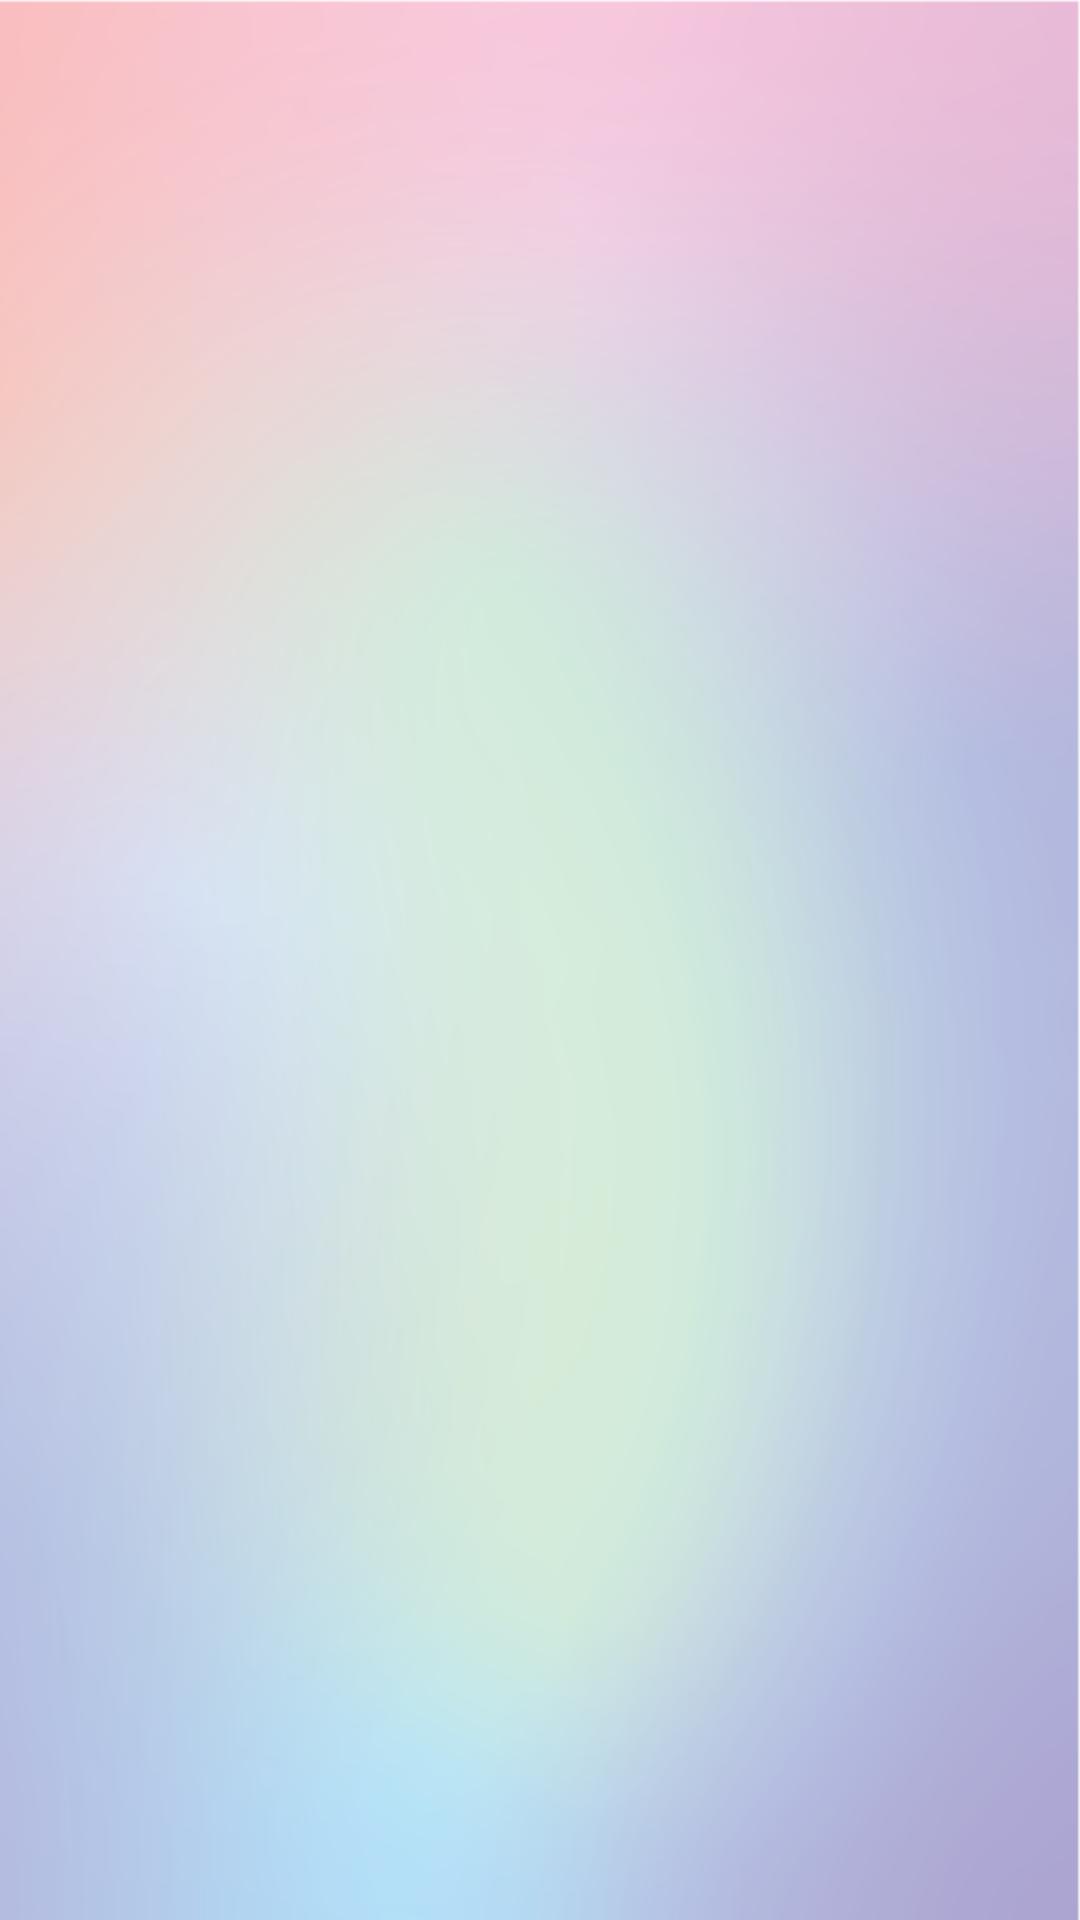 Purple Aesthetics iPhone Wallpaper or Instagram Story Template